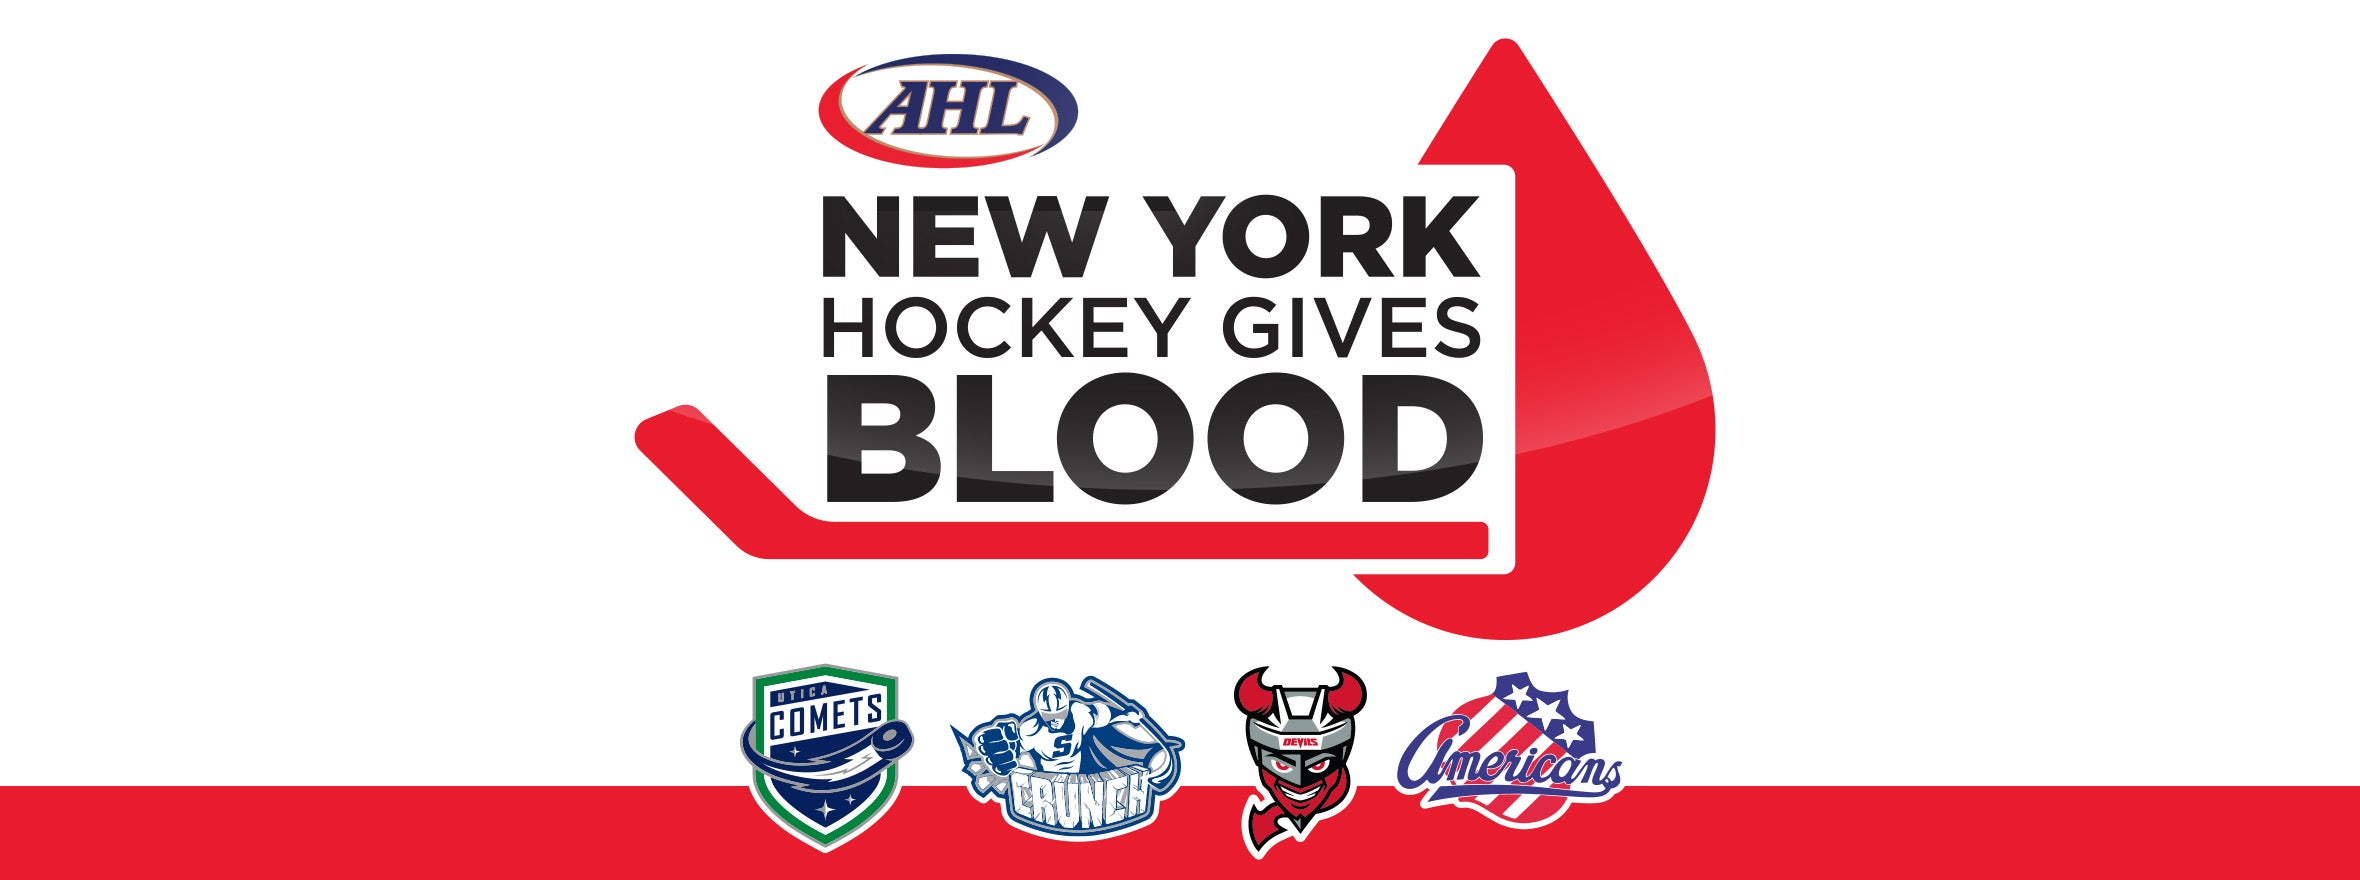 NEW YORK HOCKEY GIVES BLOOD